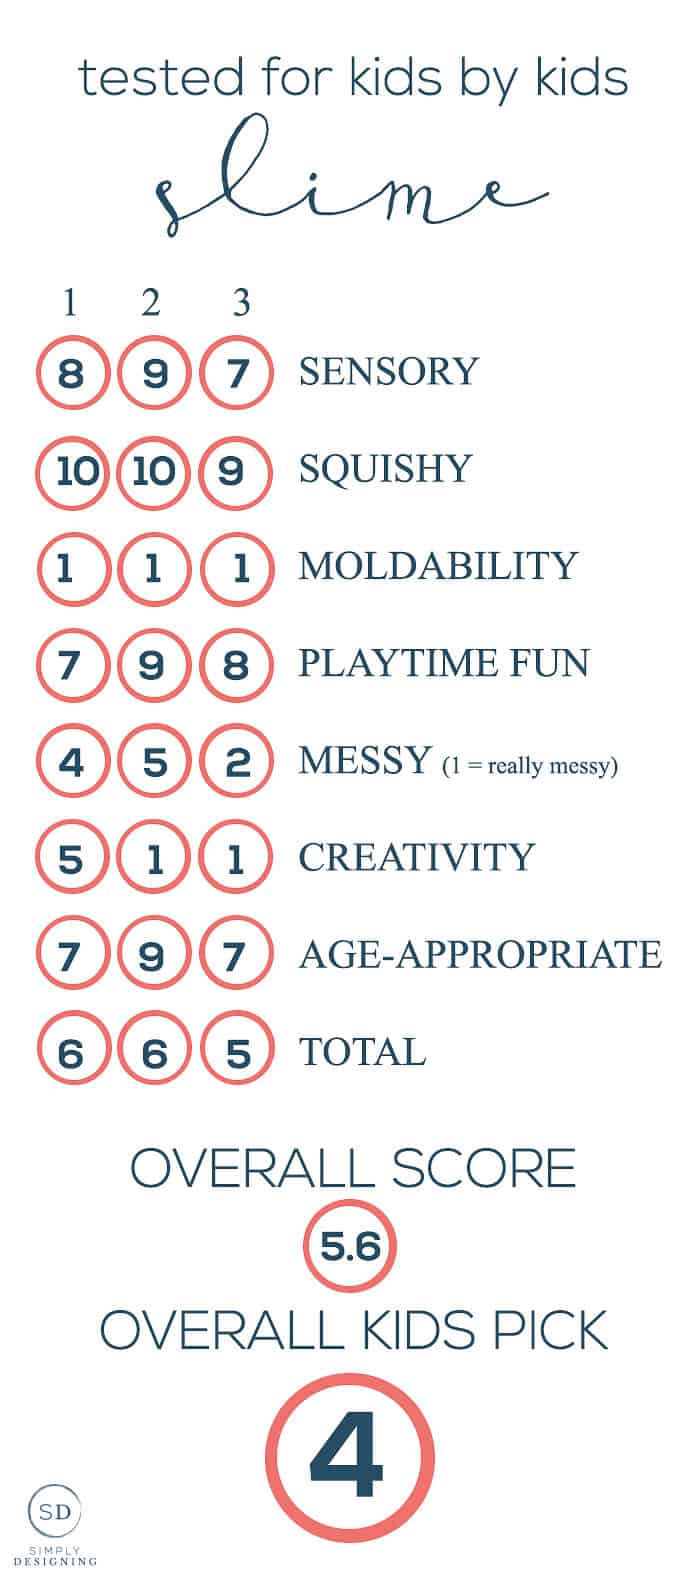 tested by kids for kids - sensory sand throwdown - slime